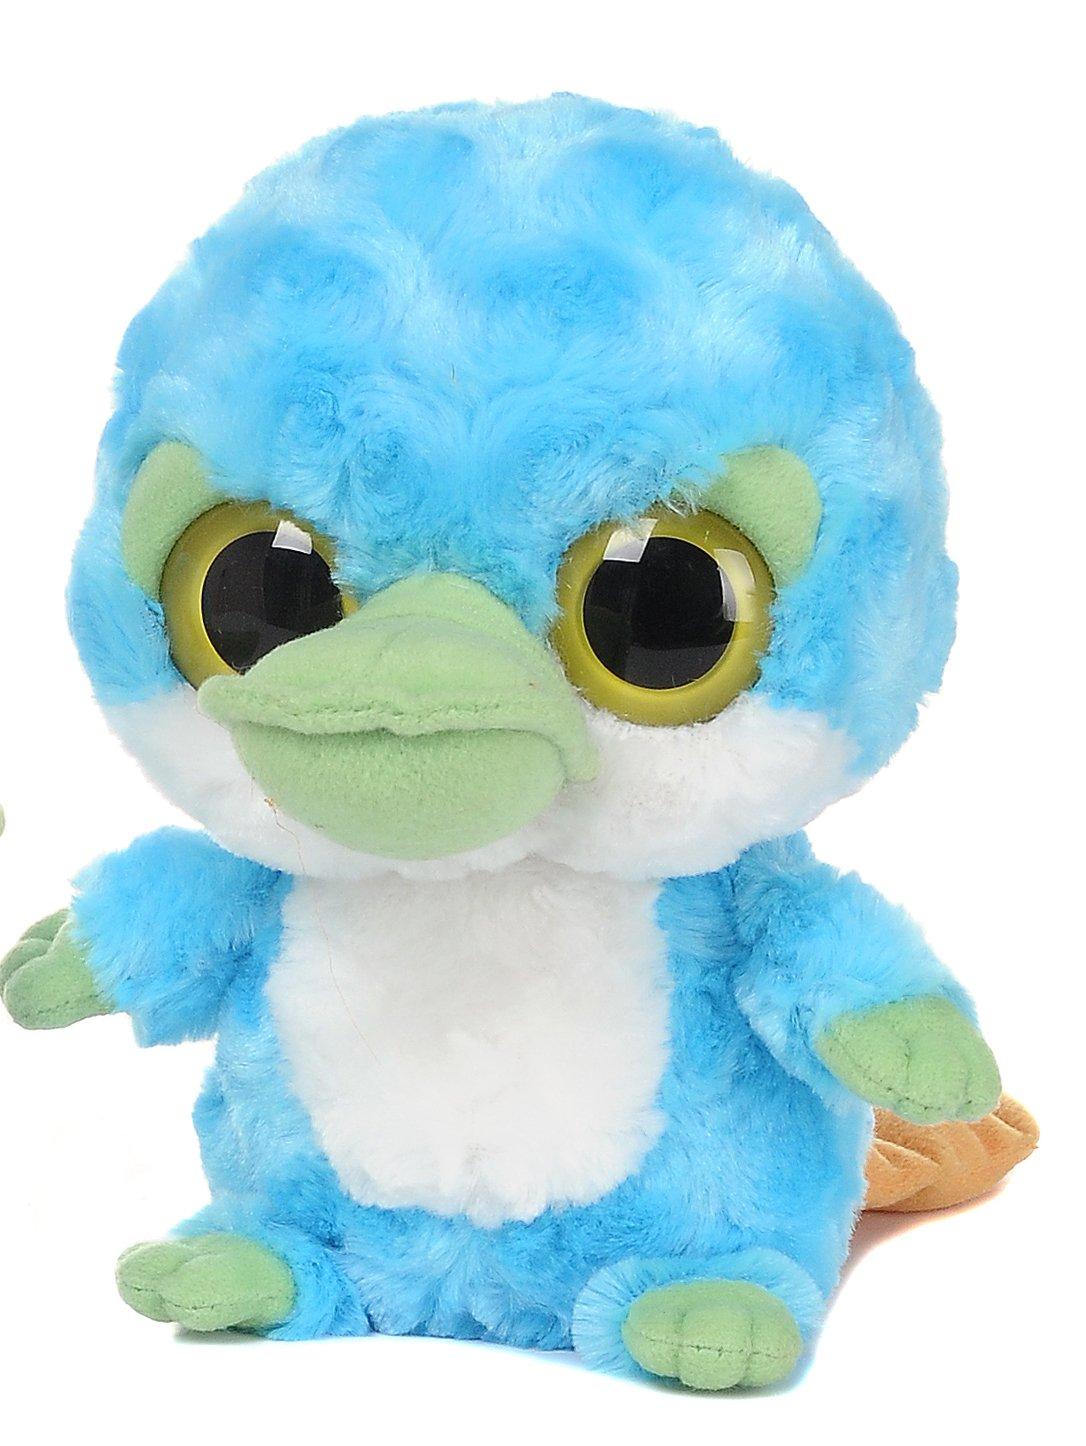 e99e3f0cdff Yoohoo   Friends Platypus 5inch  Amazon.co.uk  Toys   Games